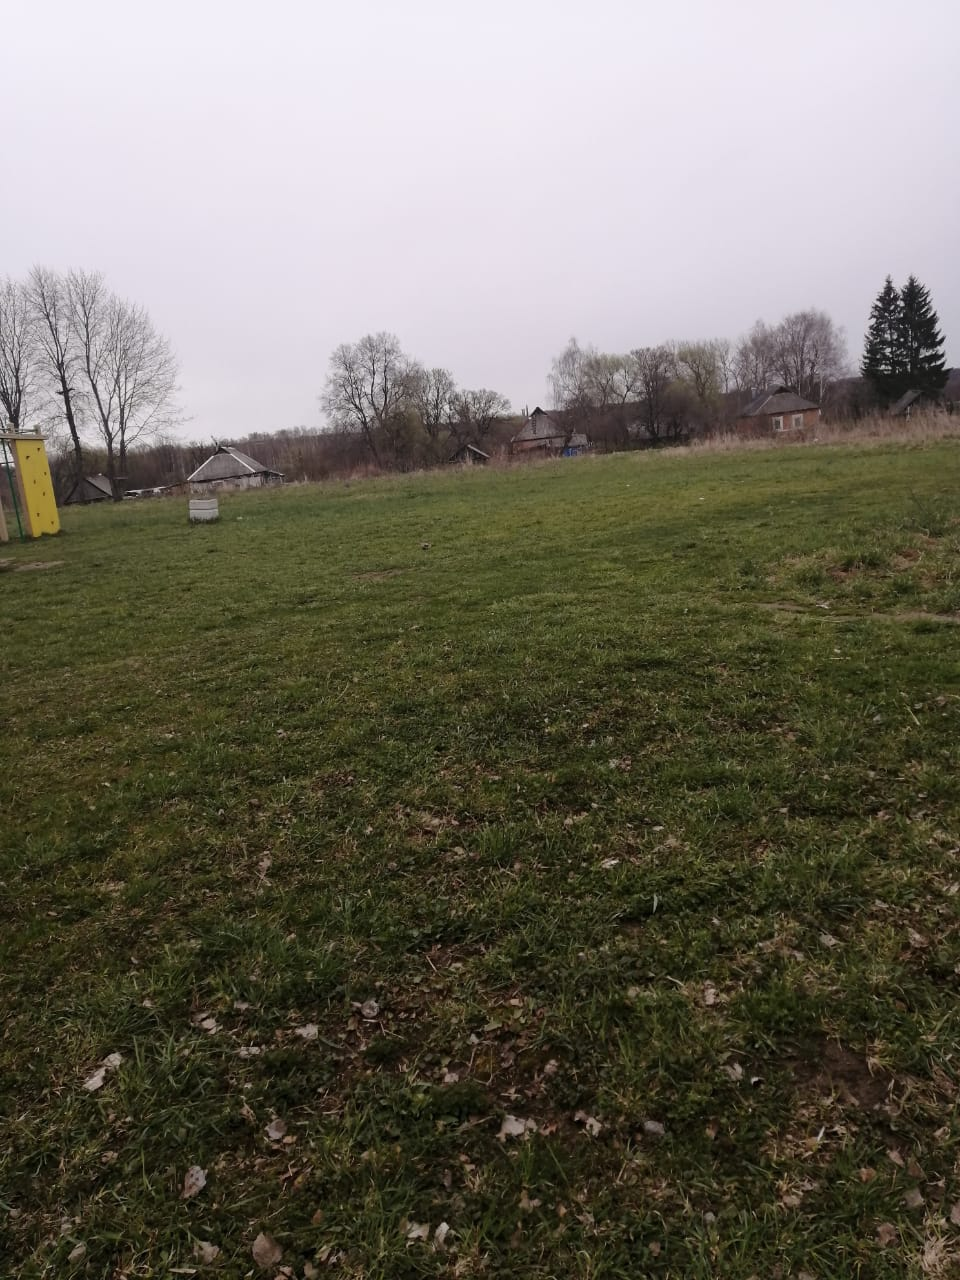 Обустройство спортивной площадки в н.п. Зубково в районе ул. Школьная